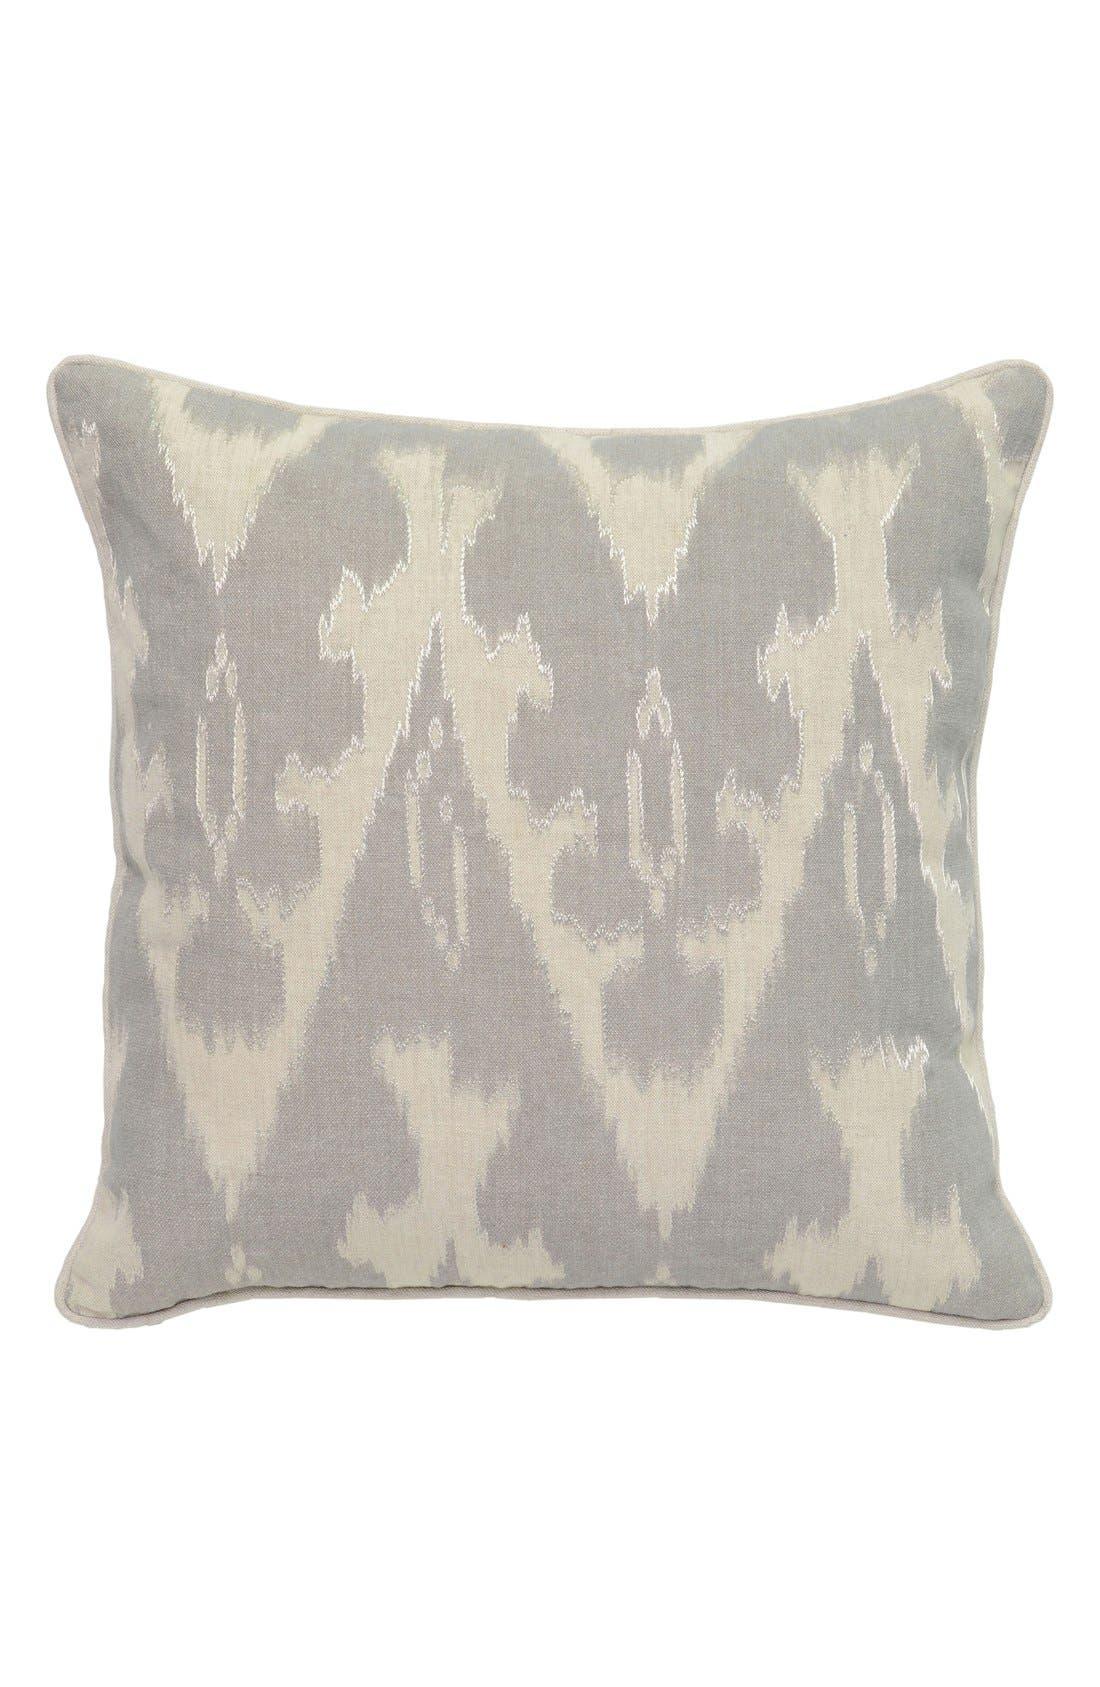 Fae Accent Pillow,                         Main,                         color, BEIGE/ GREY